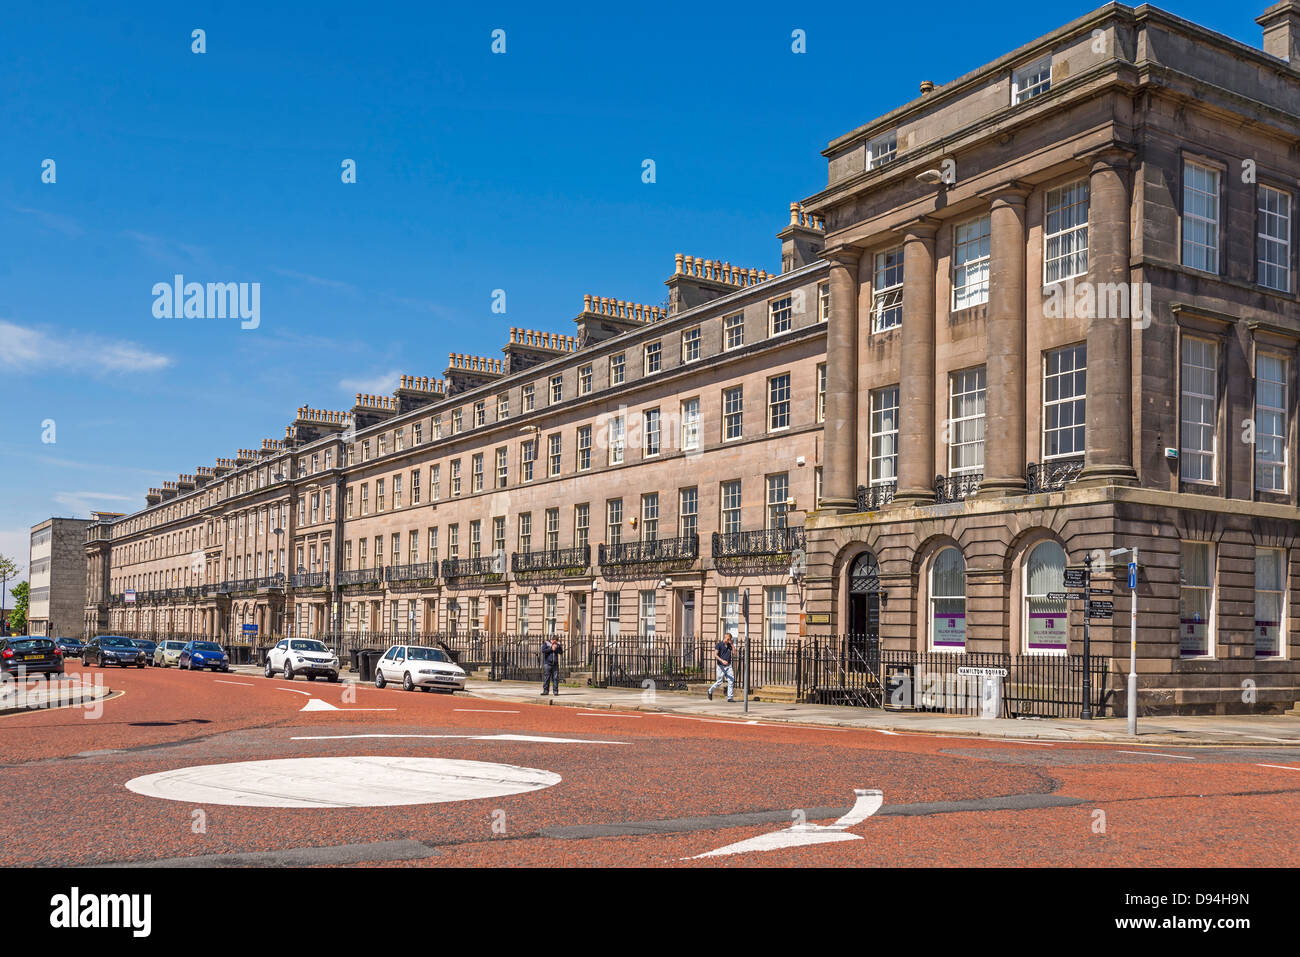 Hamilton Square Birkenhead. Georgian buildings - Stock Image